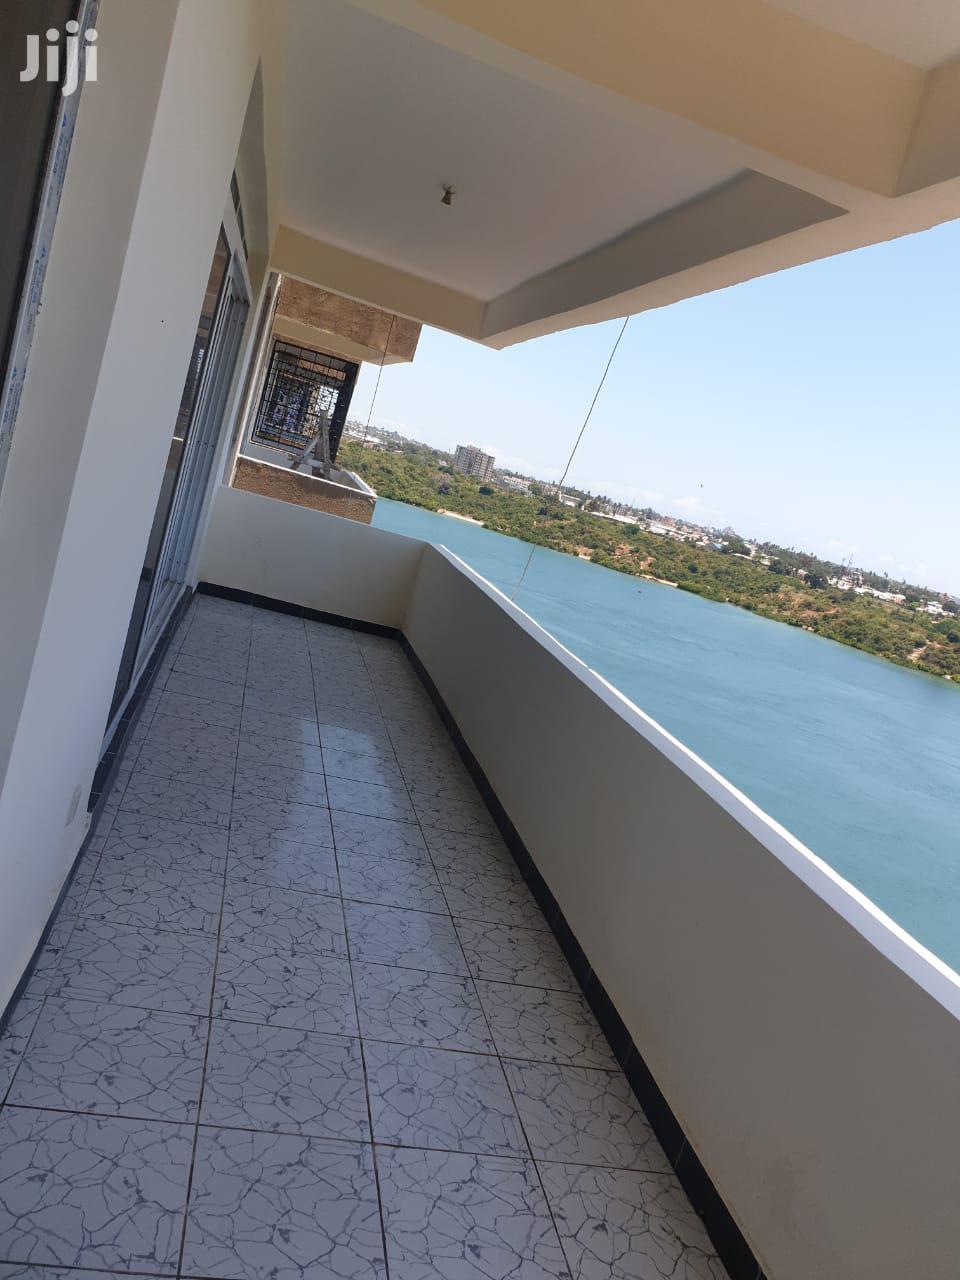 Majestic Sea View 3 Bedroom Apartment For Sale In Tudor